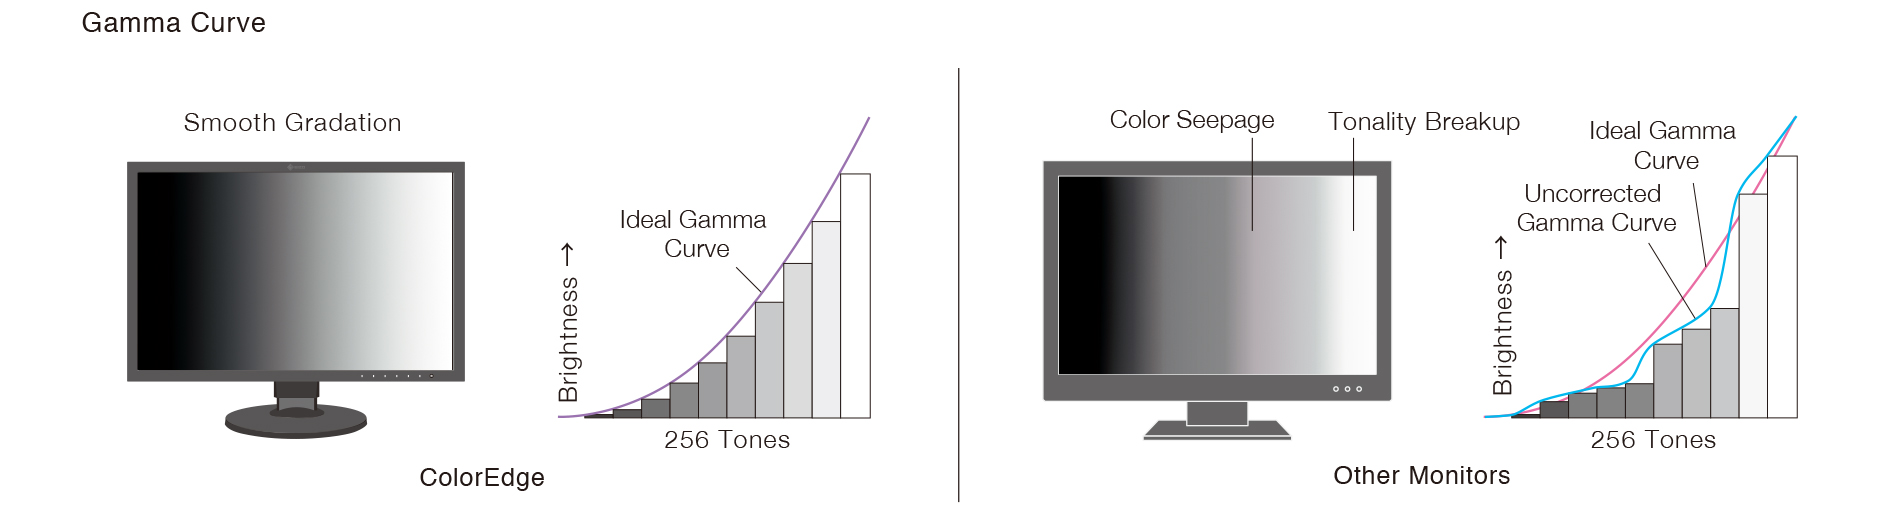 calibration-sensor_002.jpg